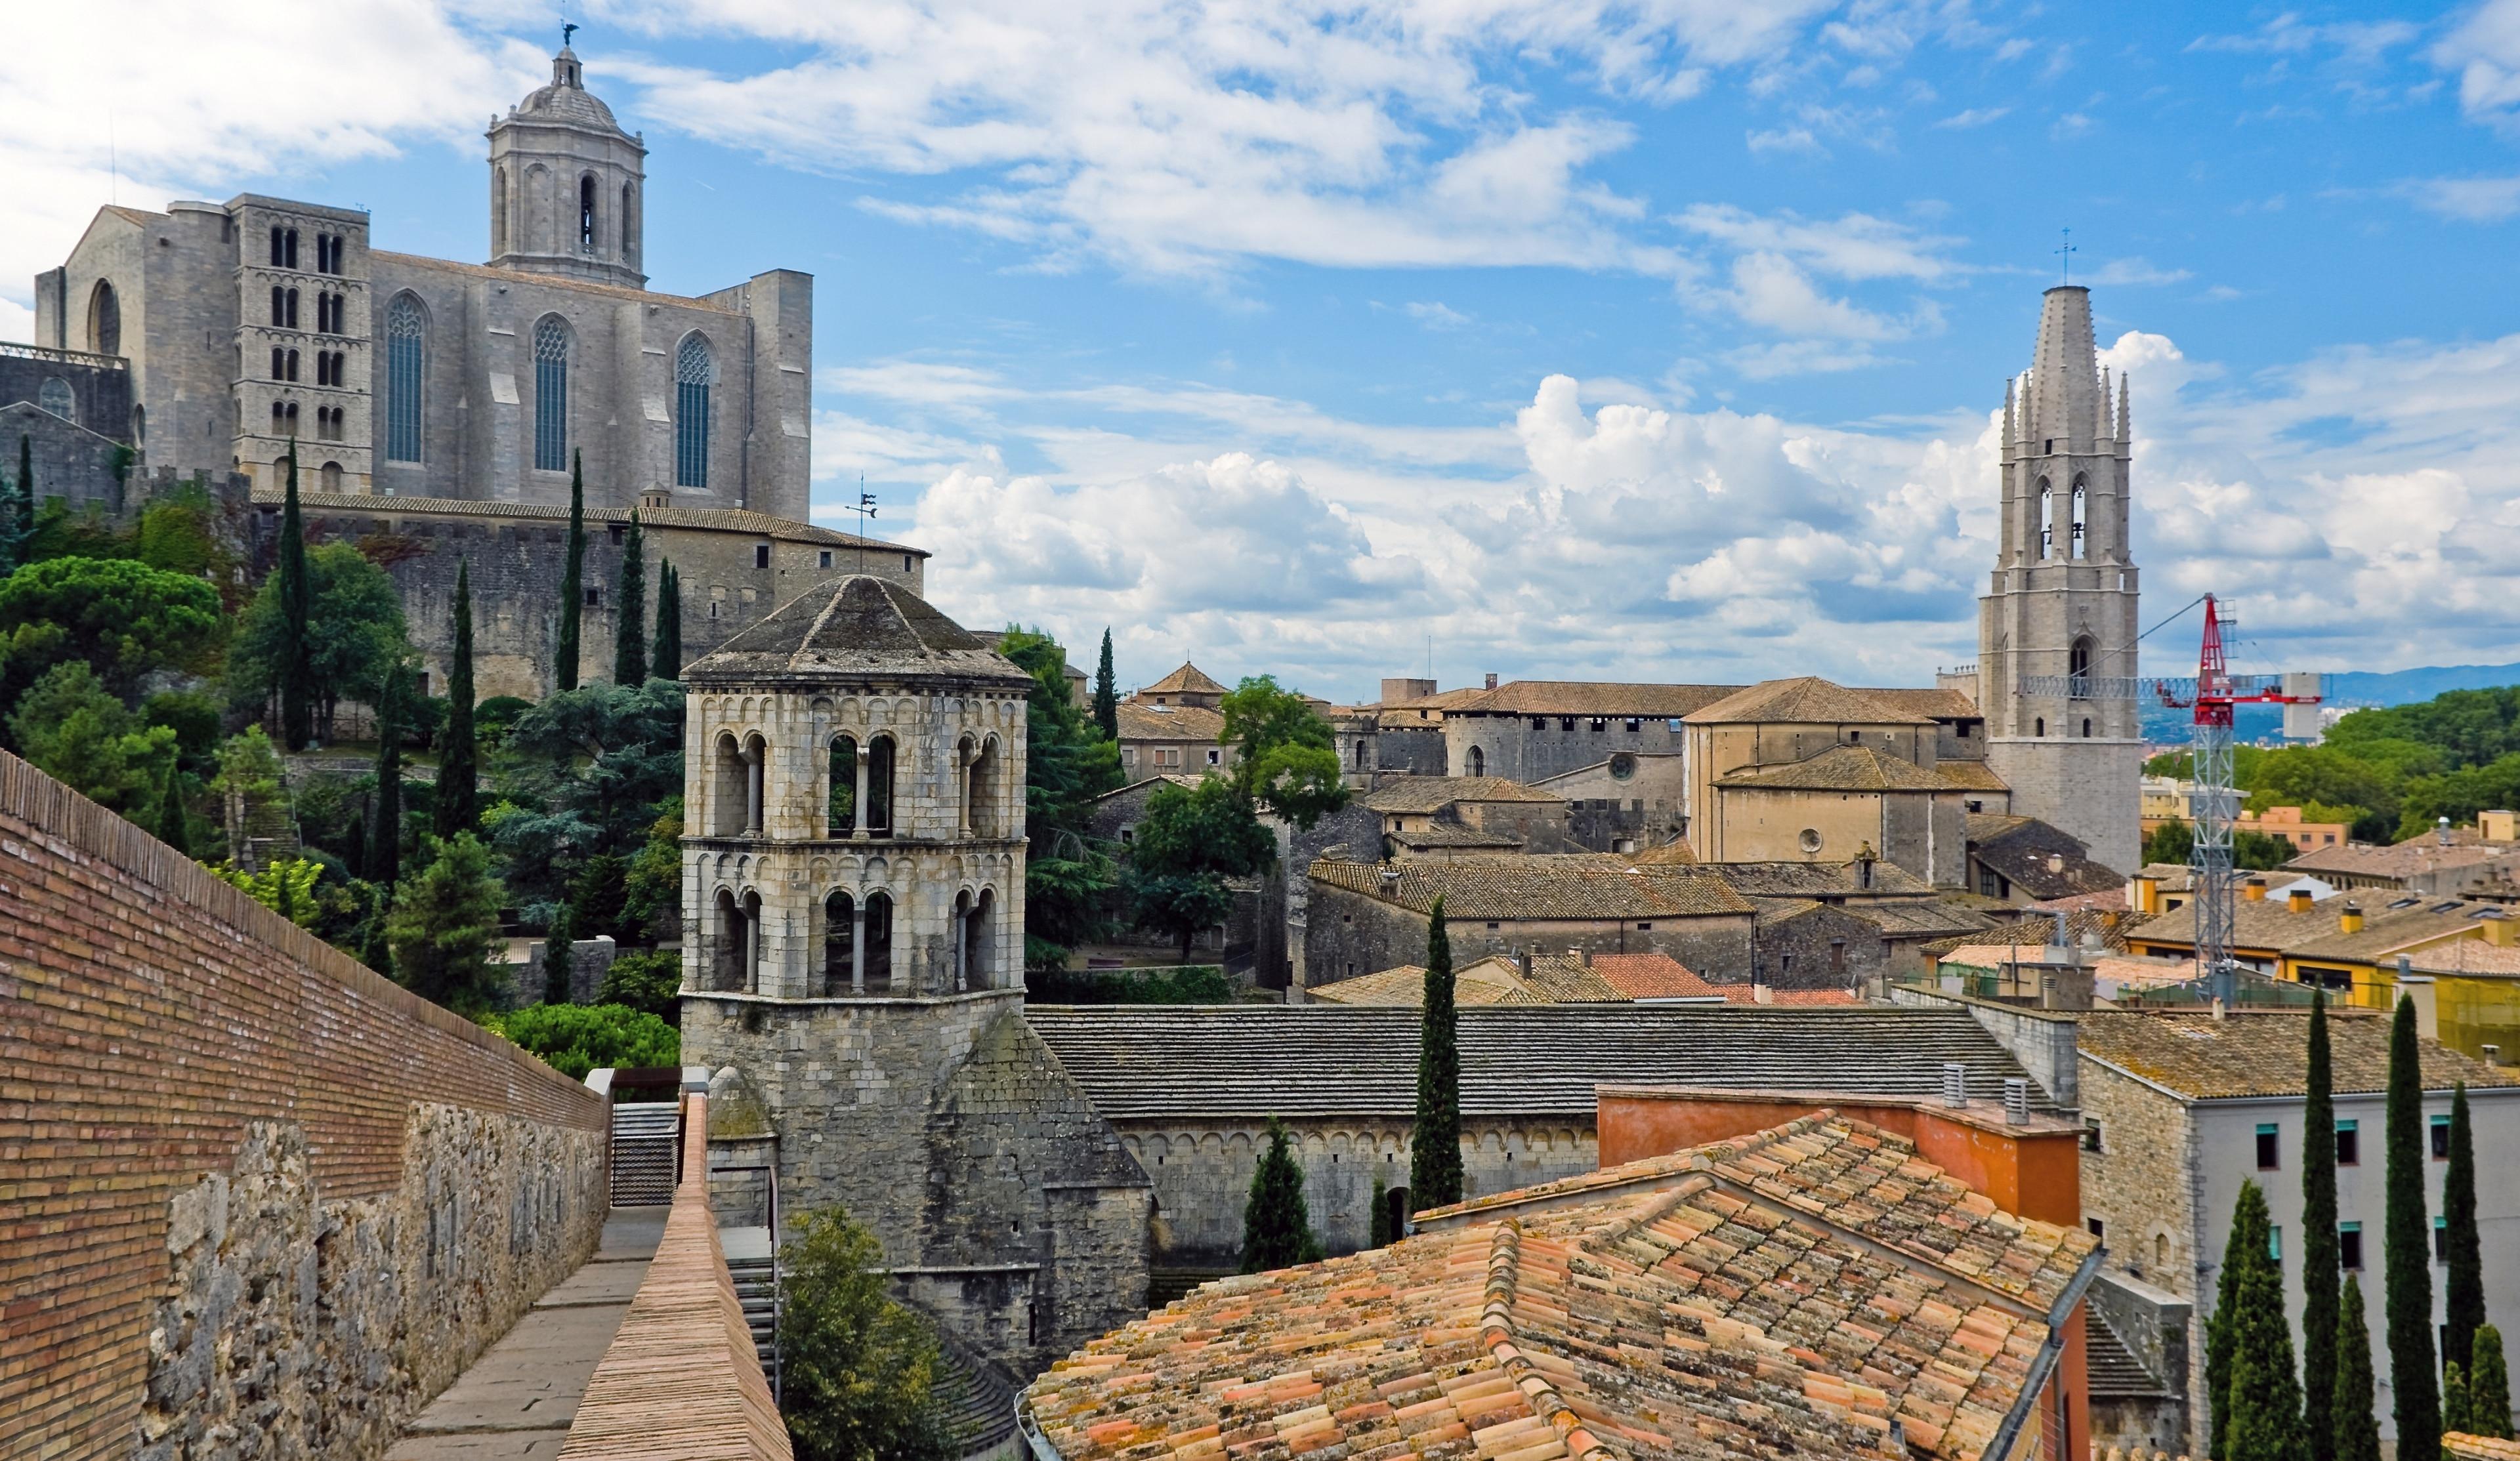 Old Town Girona, Girona, Catalonia, Spain